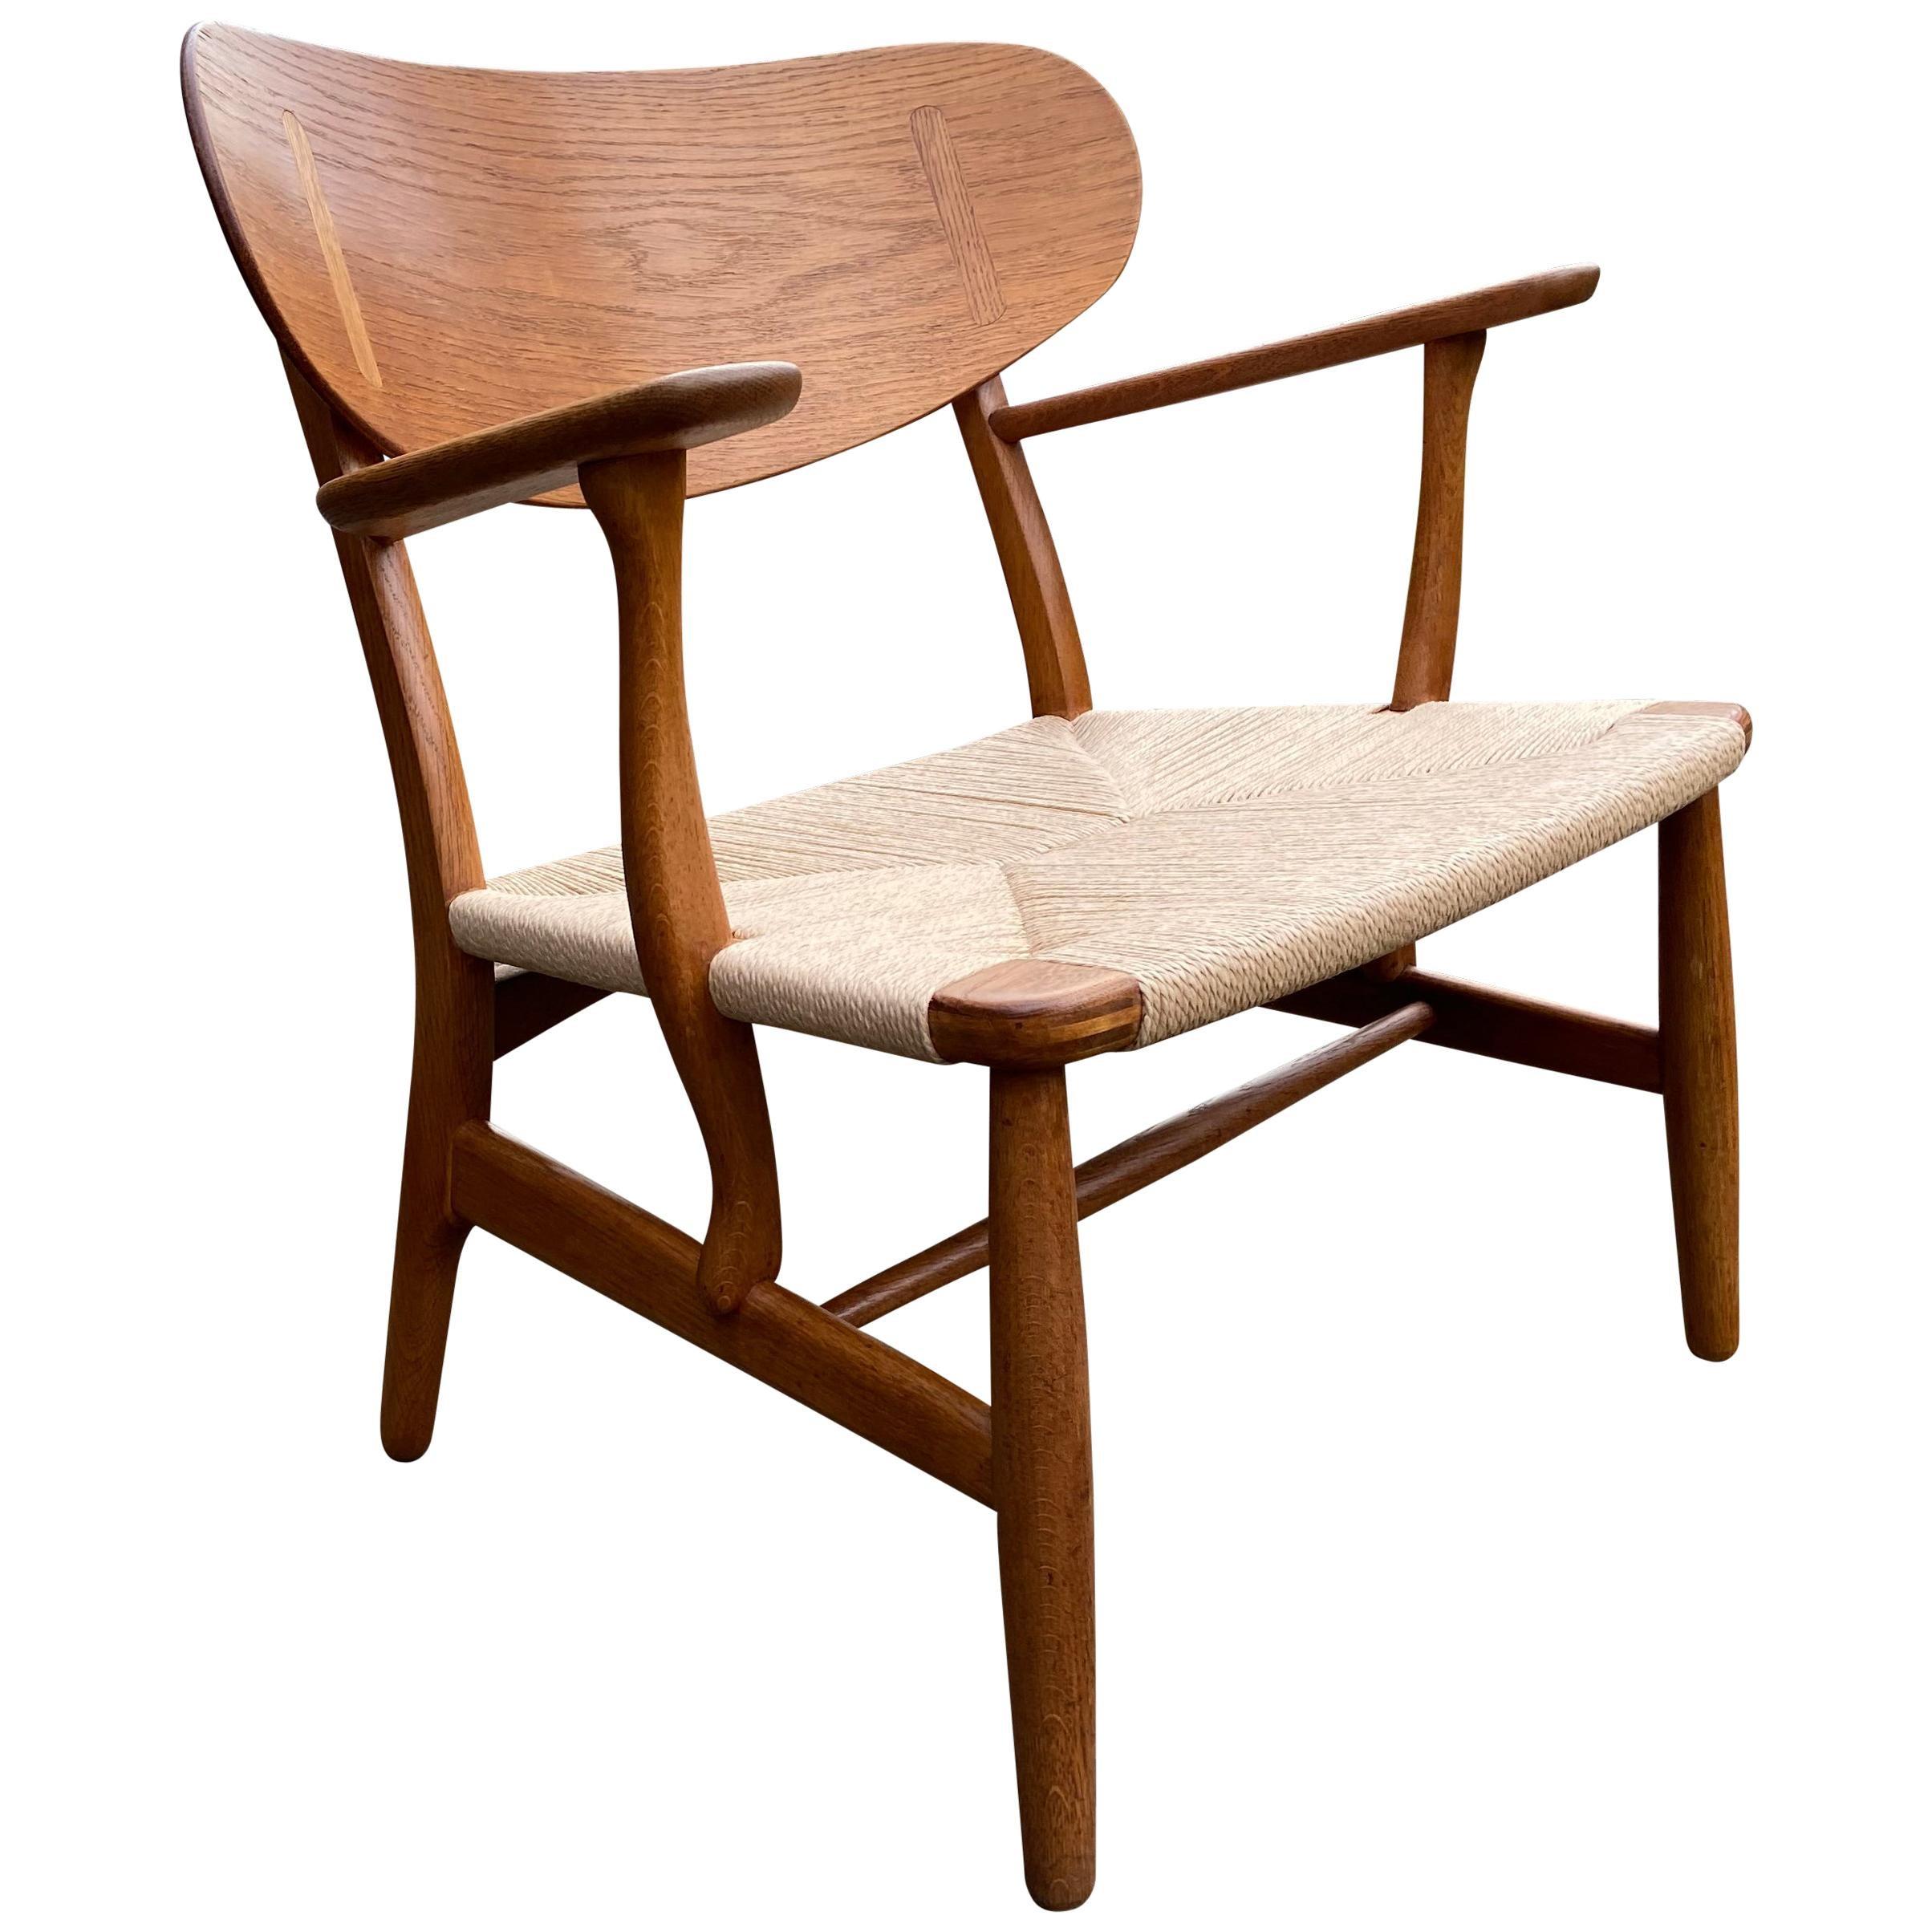 Oak CH22 Lounge Chair by Hans J. Wegner for Carl Hansen